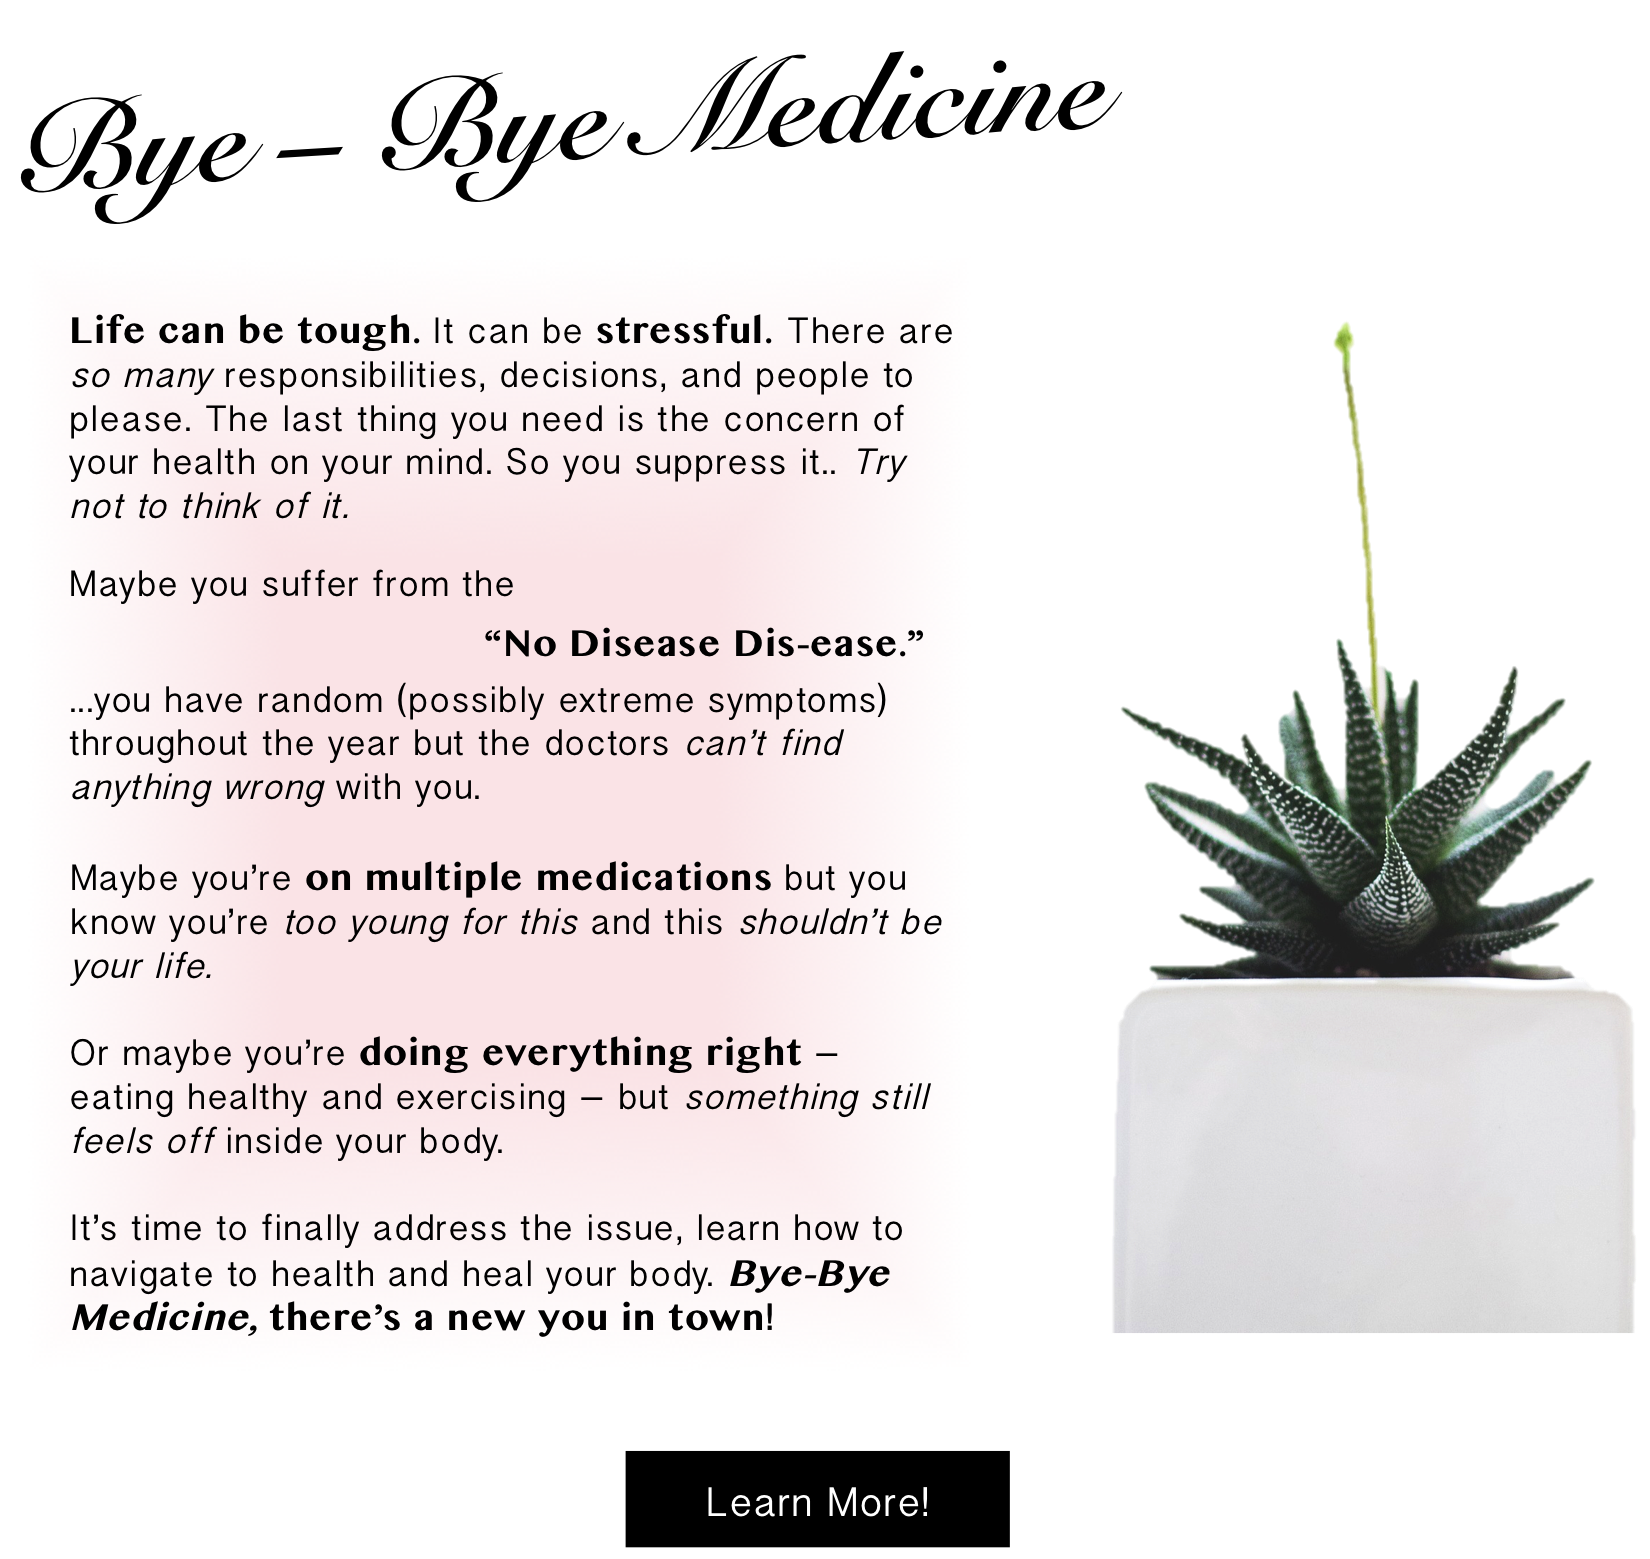 Bye-Bye Medicine Healing Program